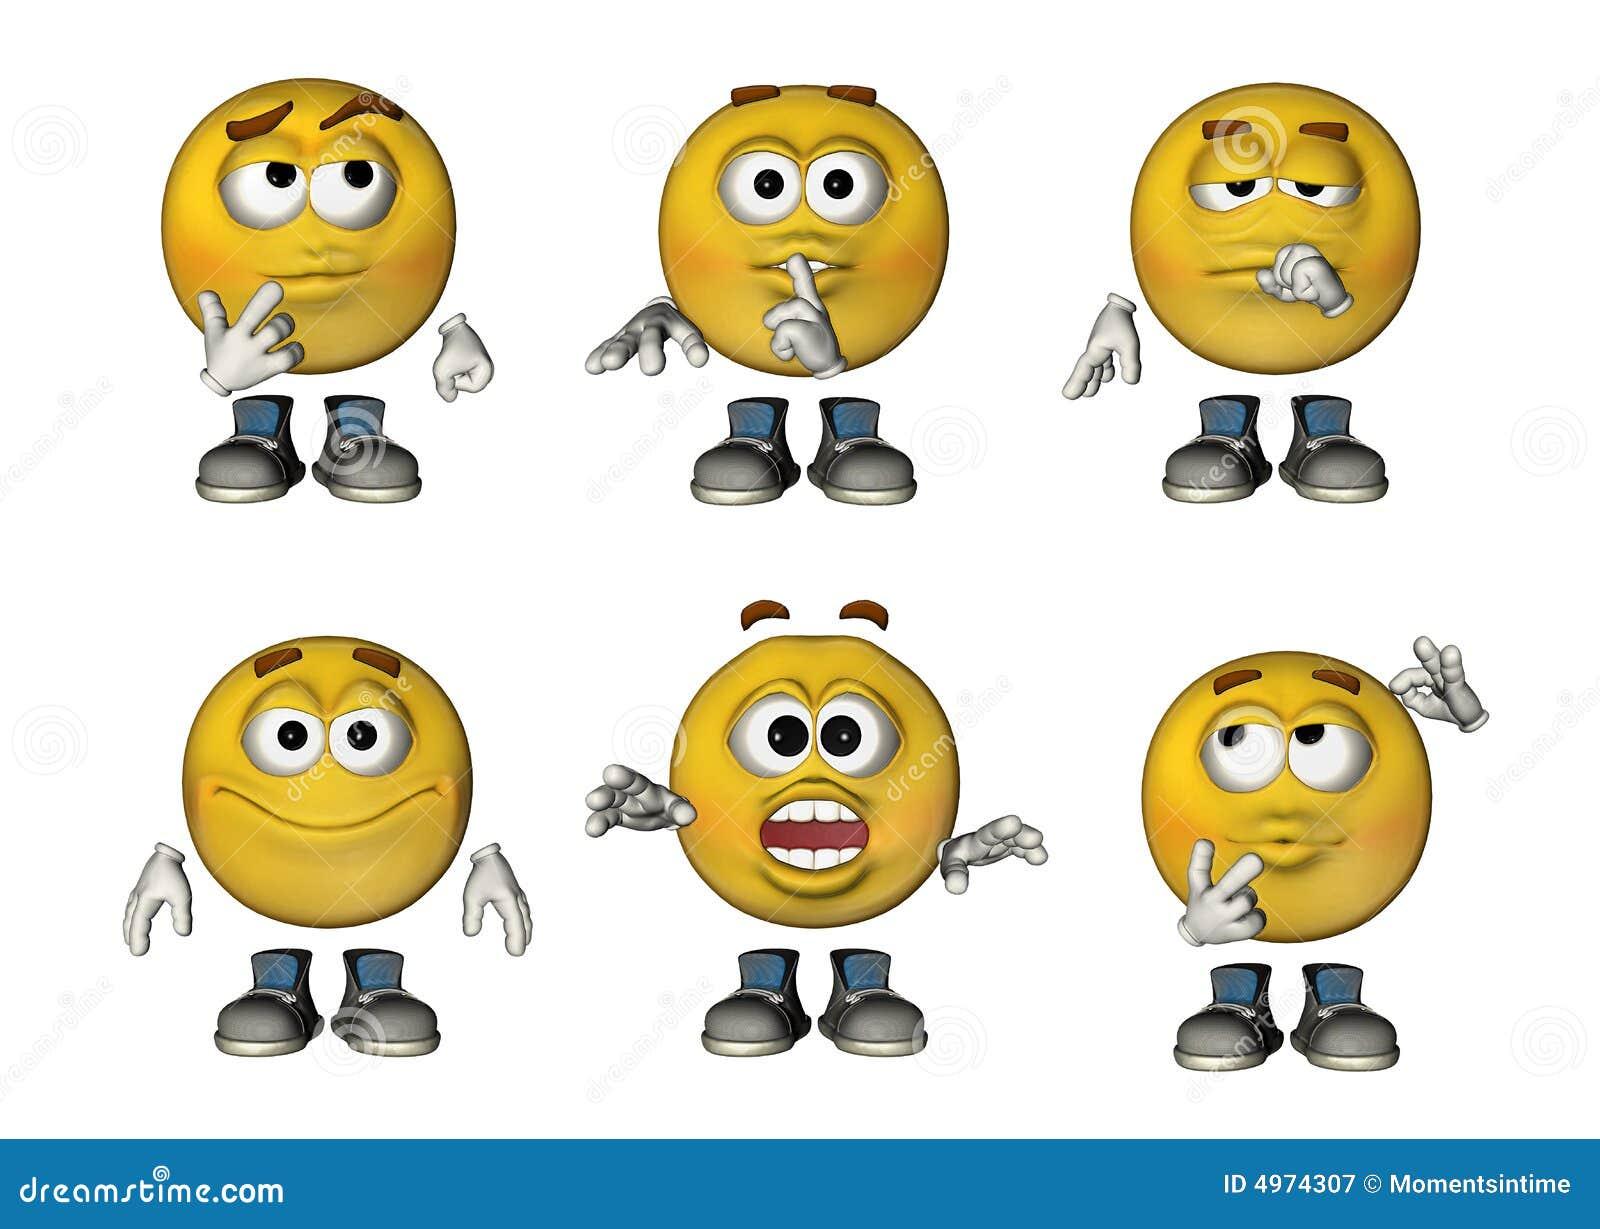 3d emoticons set 3 stock illustration. illustration of smiley - 4974307